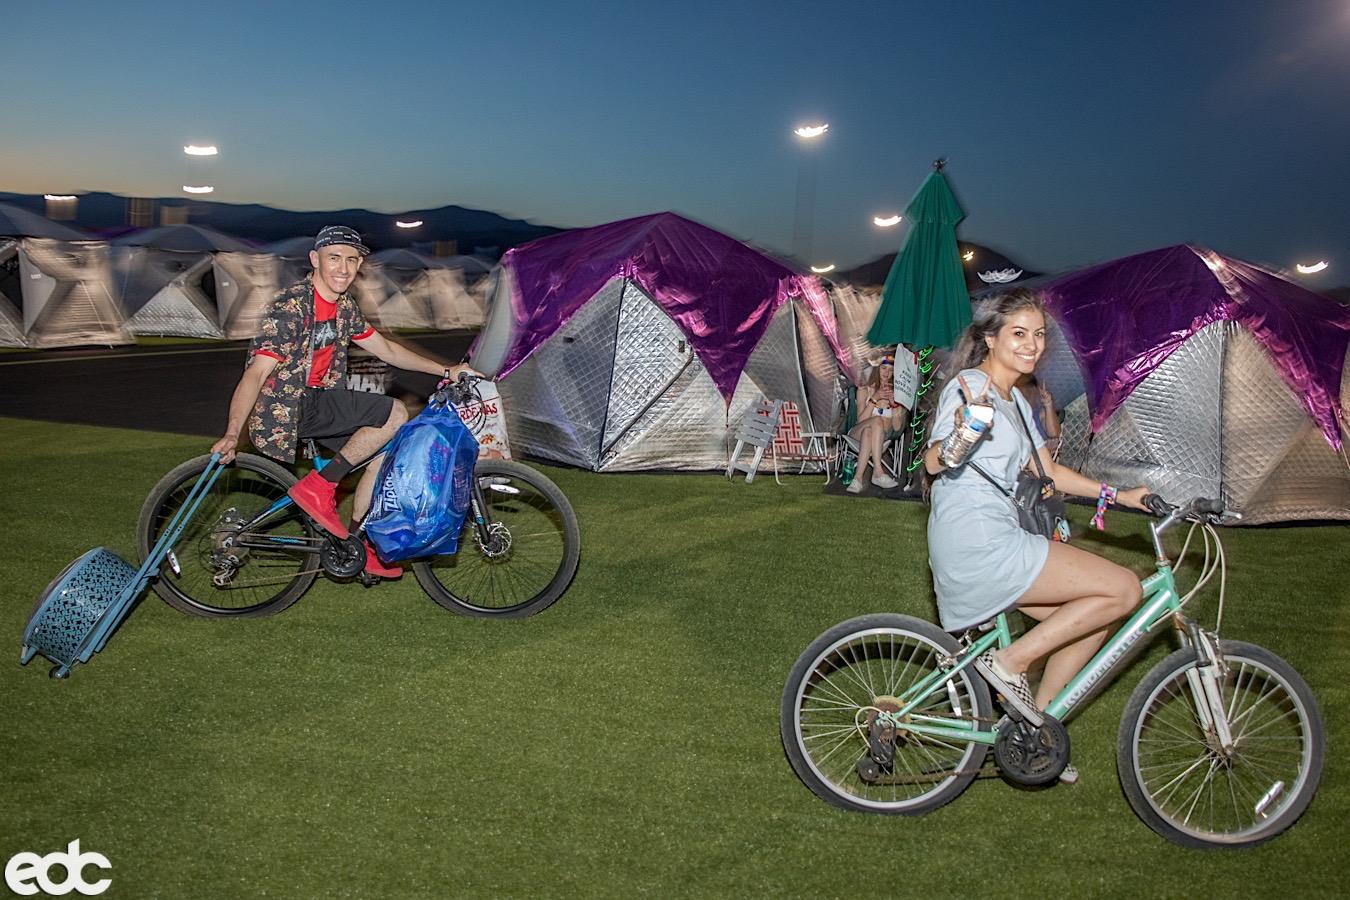 Camp EDC  - Photo Credit: Insomniac Events